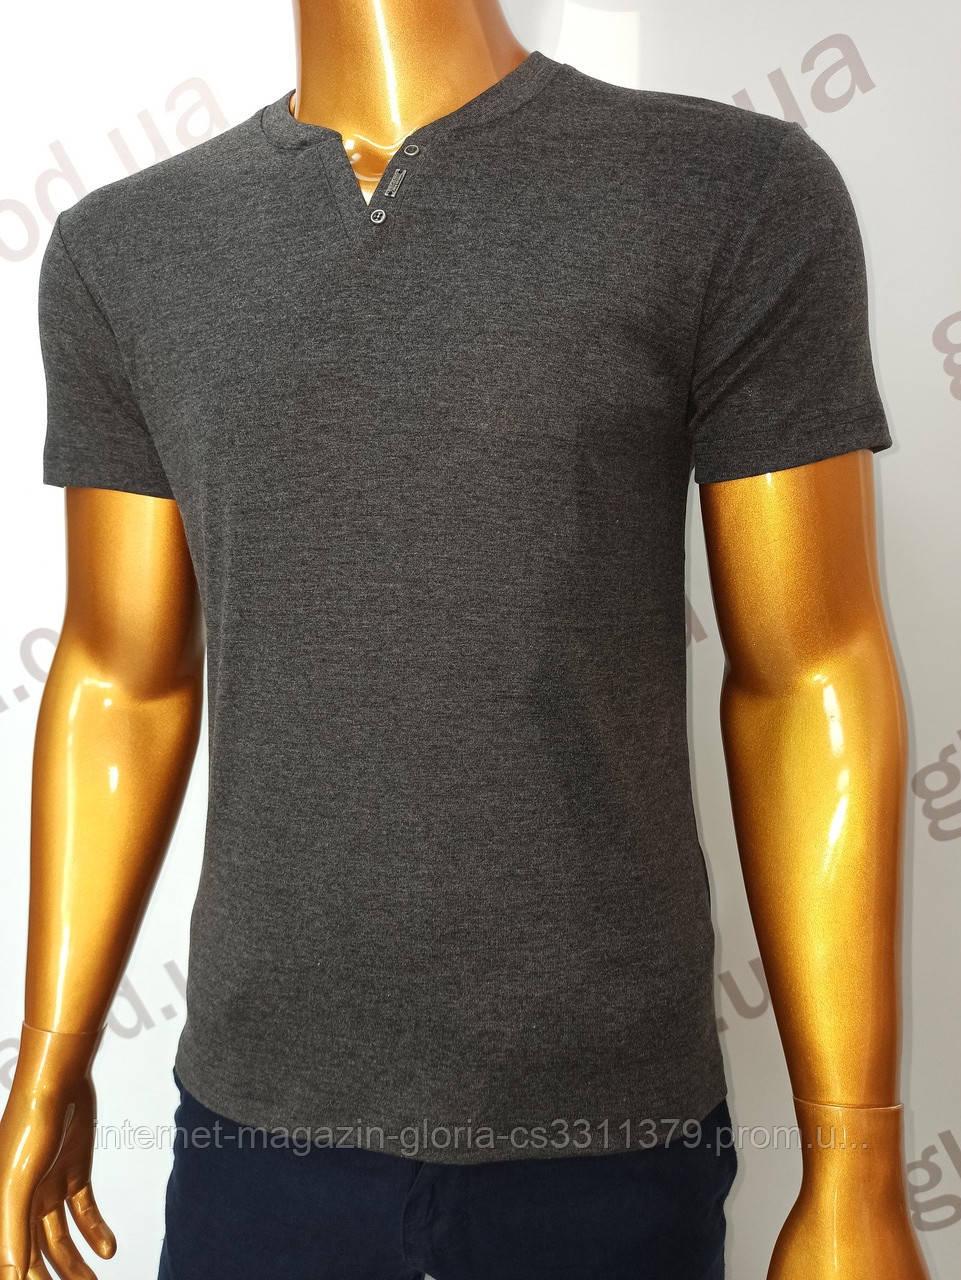 Мужская футболка MSY. 23214-8189(cr). Размеры: M,L,XL,XXL.